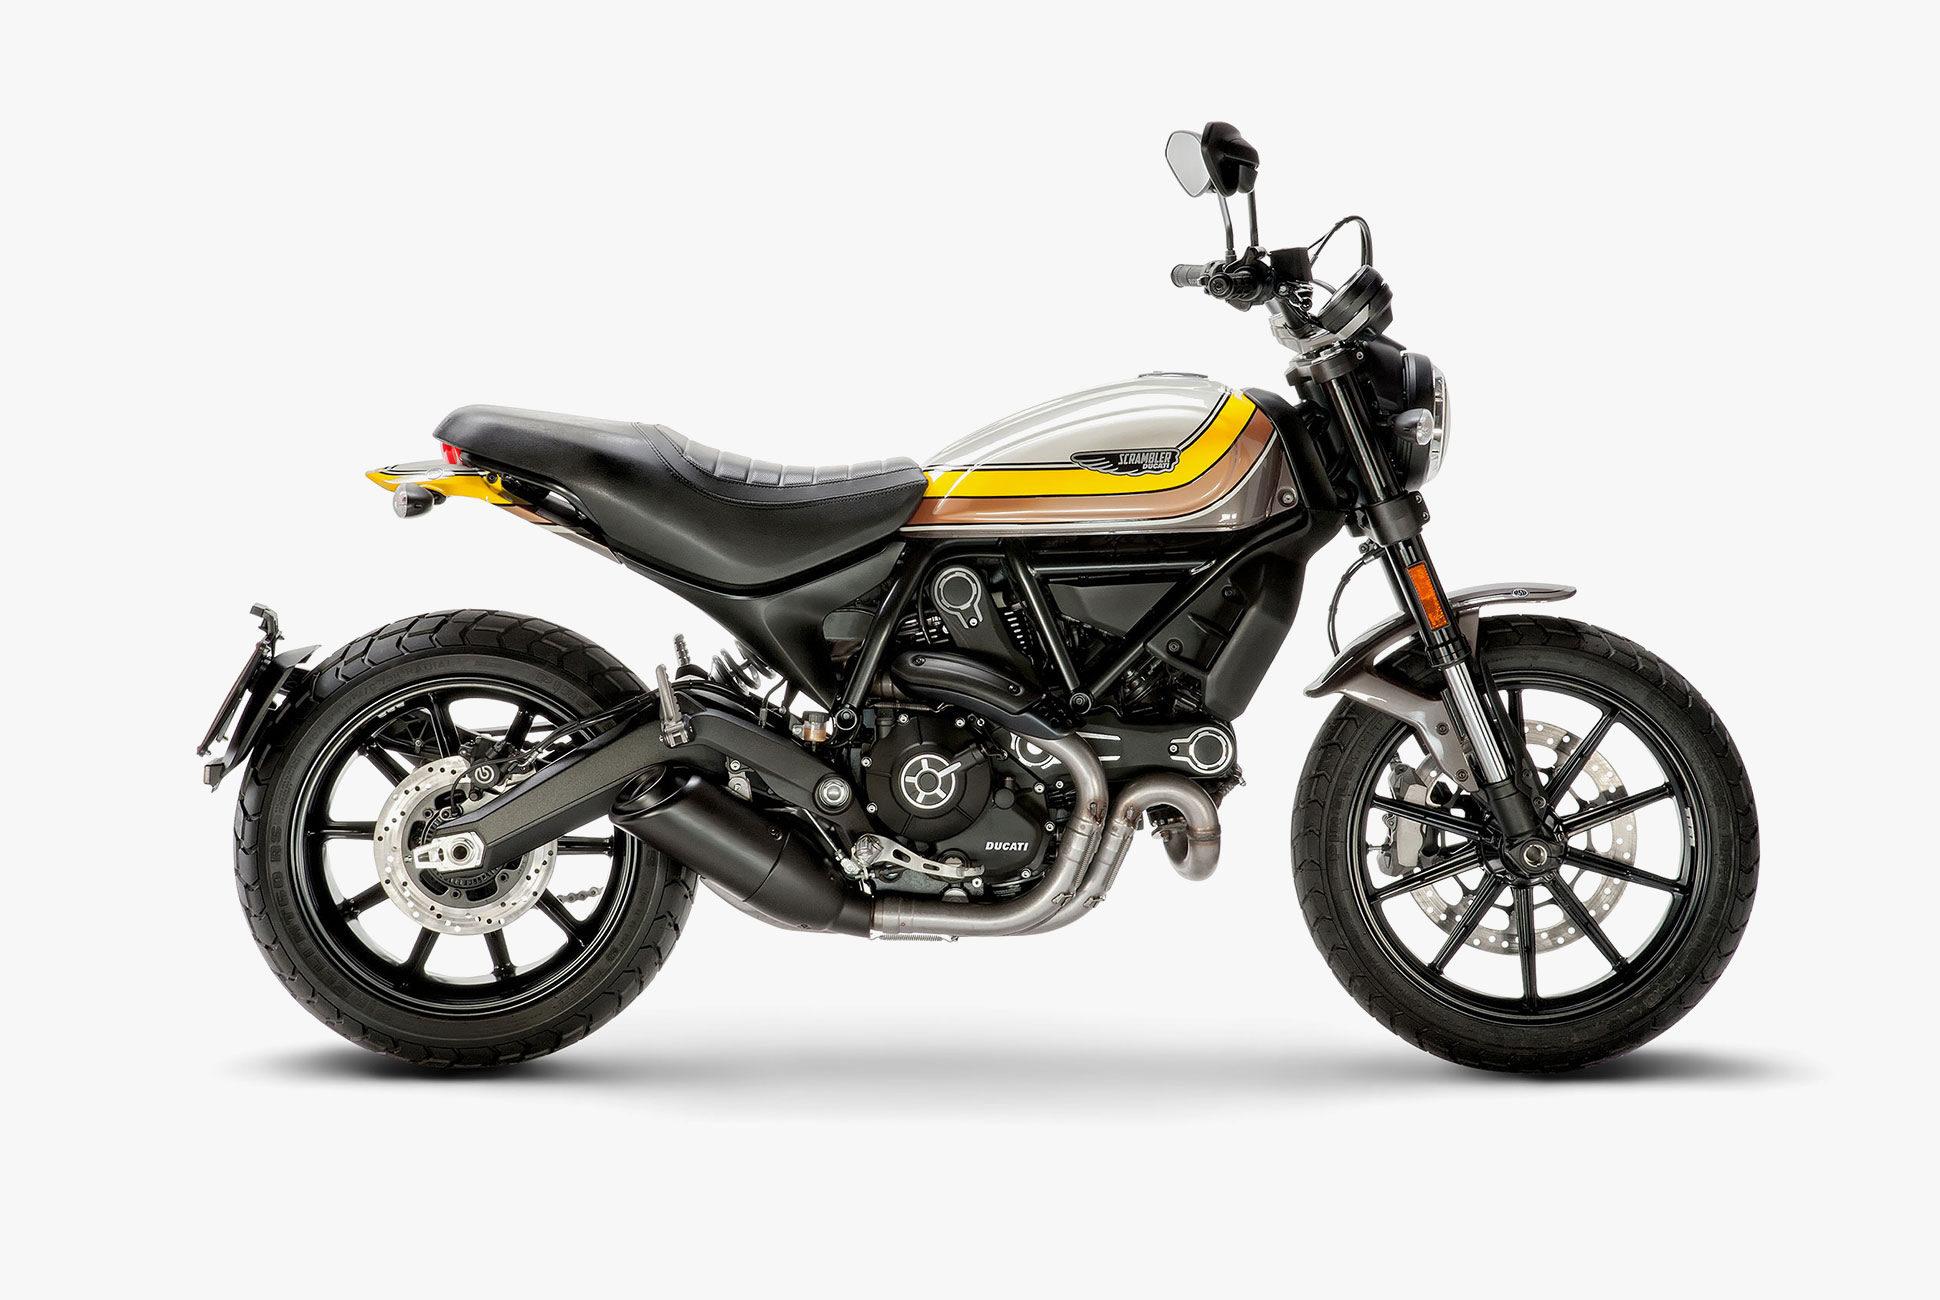 Ducati-Scrambler-gear-patrol-2-1940x1300.jpg